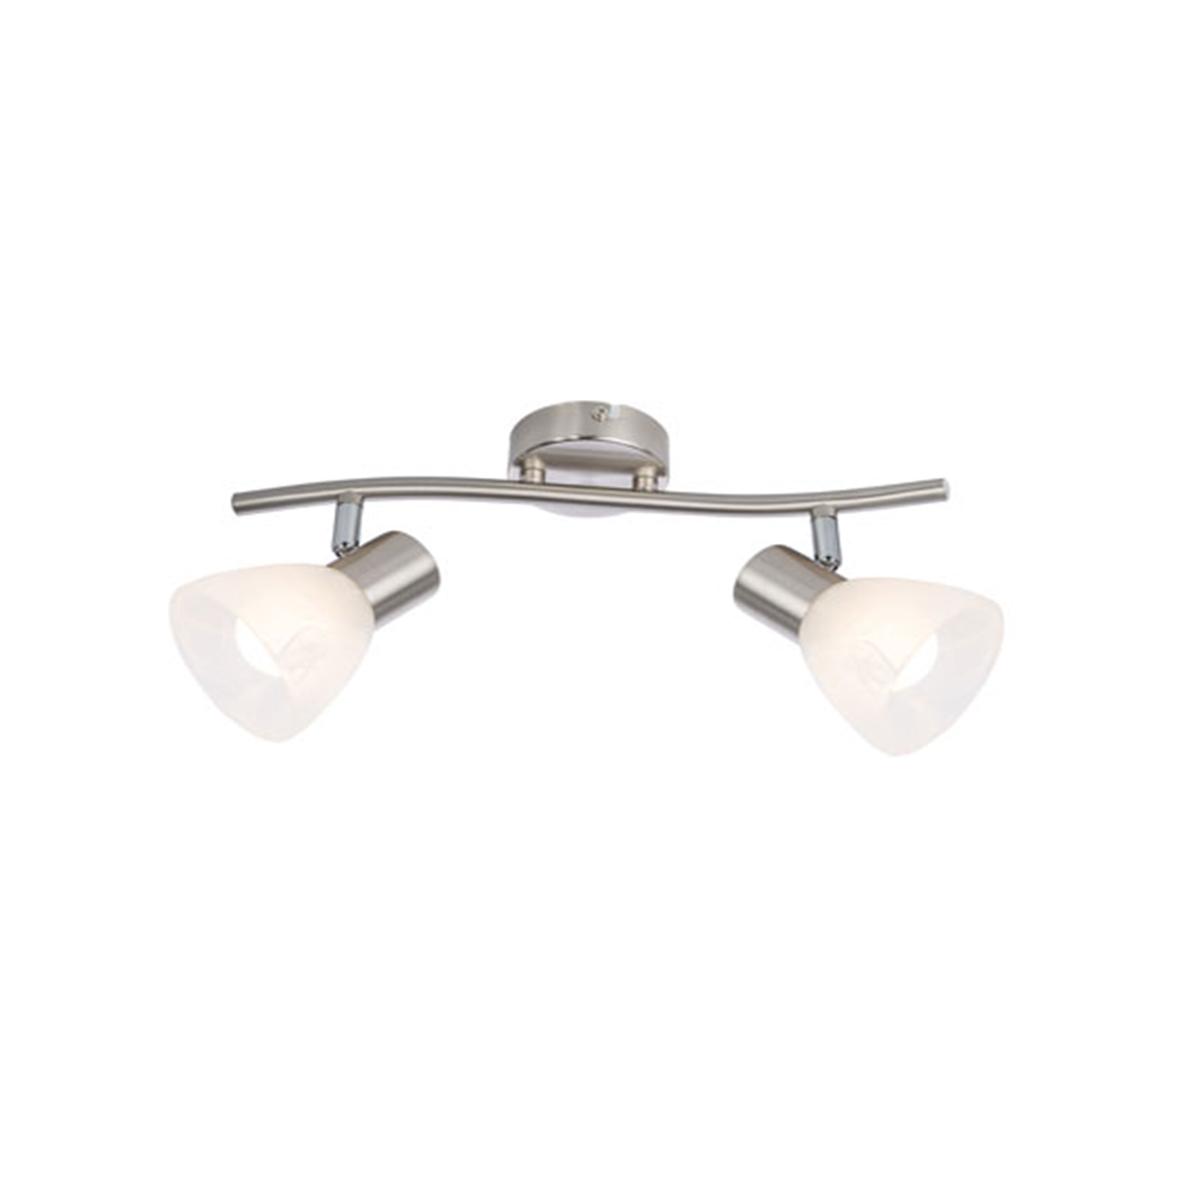 Spot lampa Vera/2 6602060